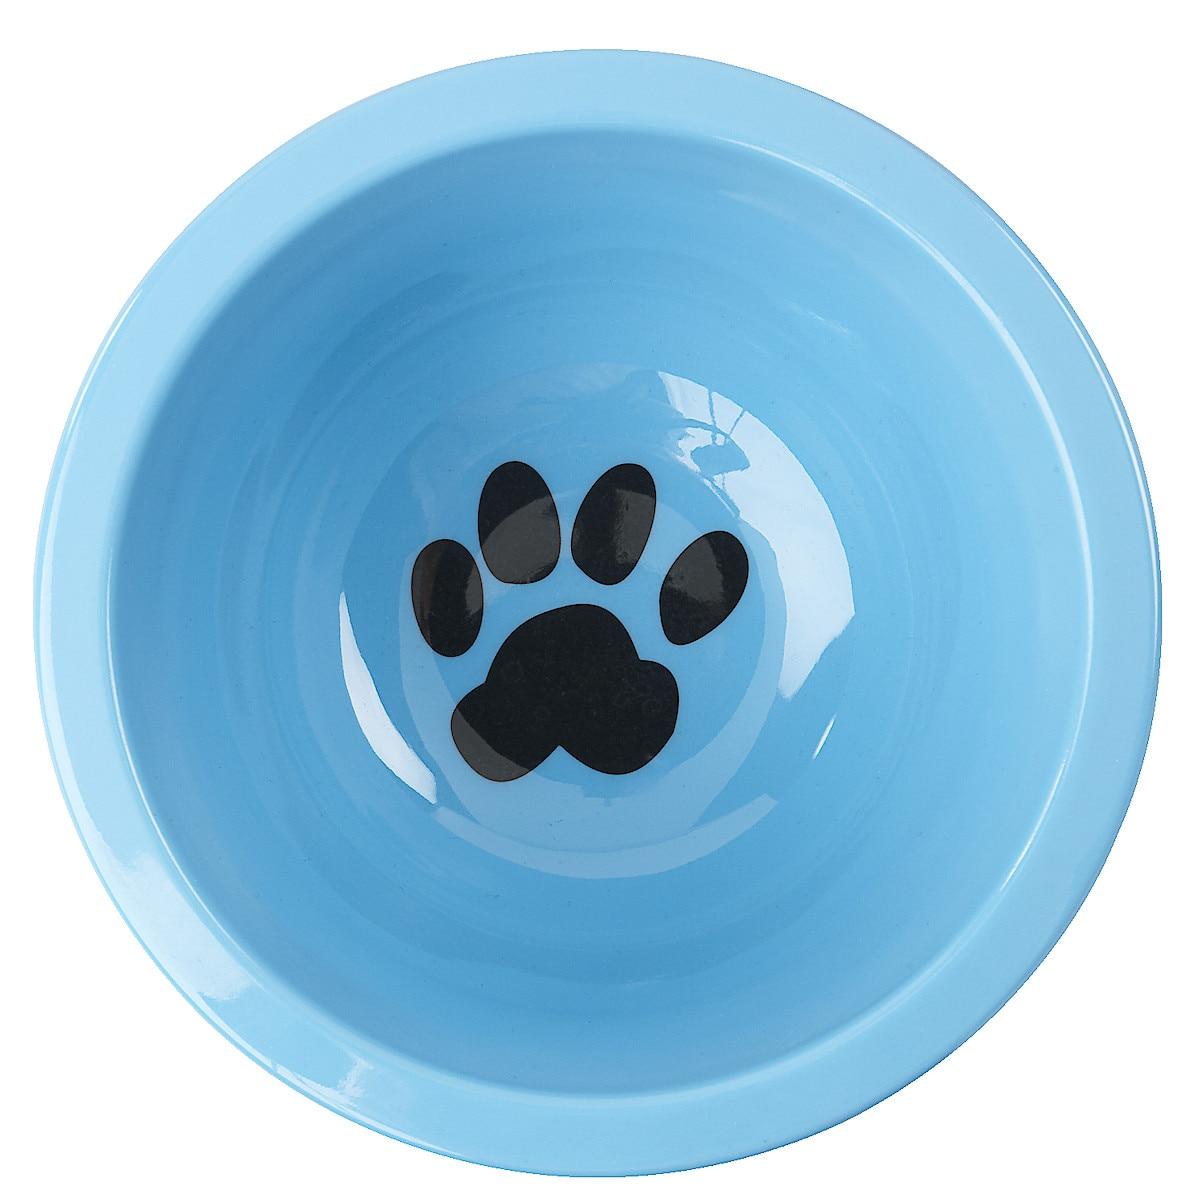 0.8-Litre Feeding Bowl